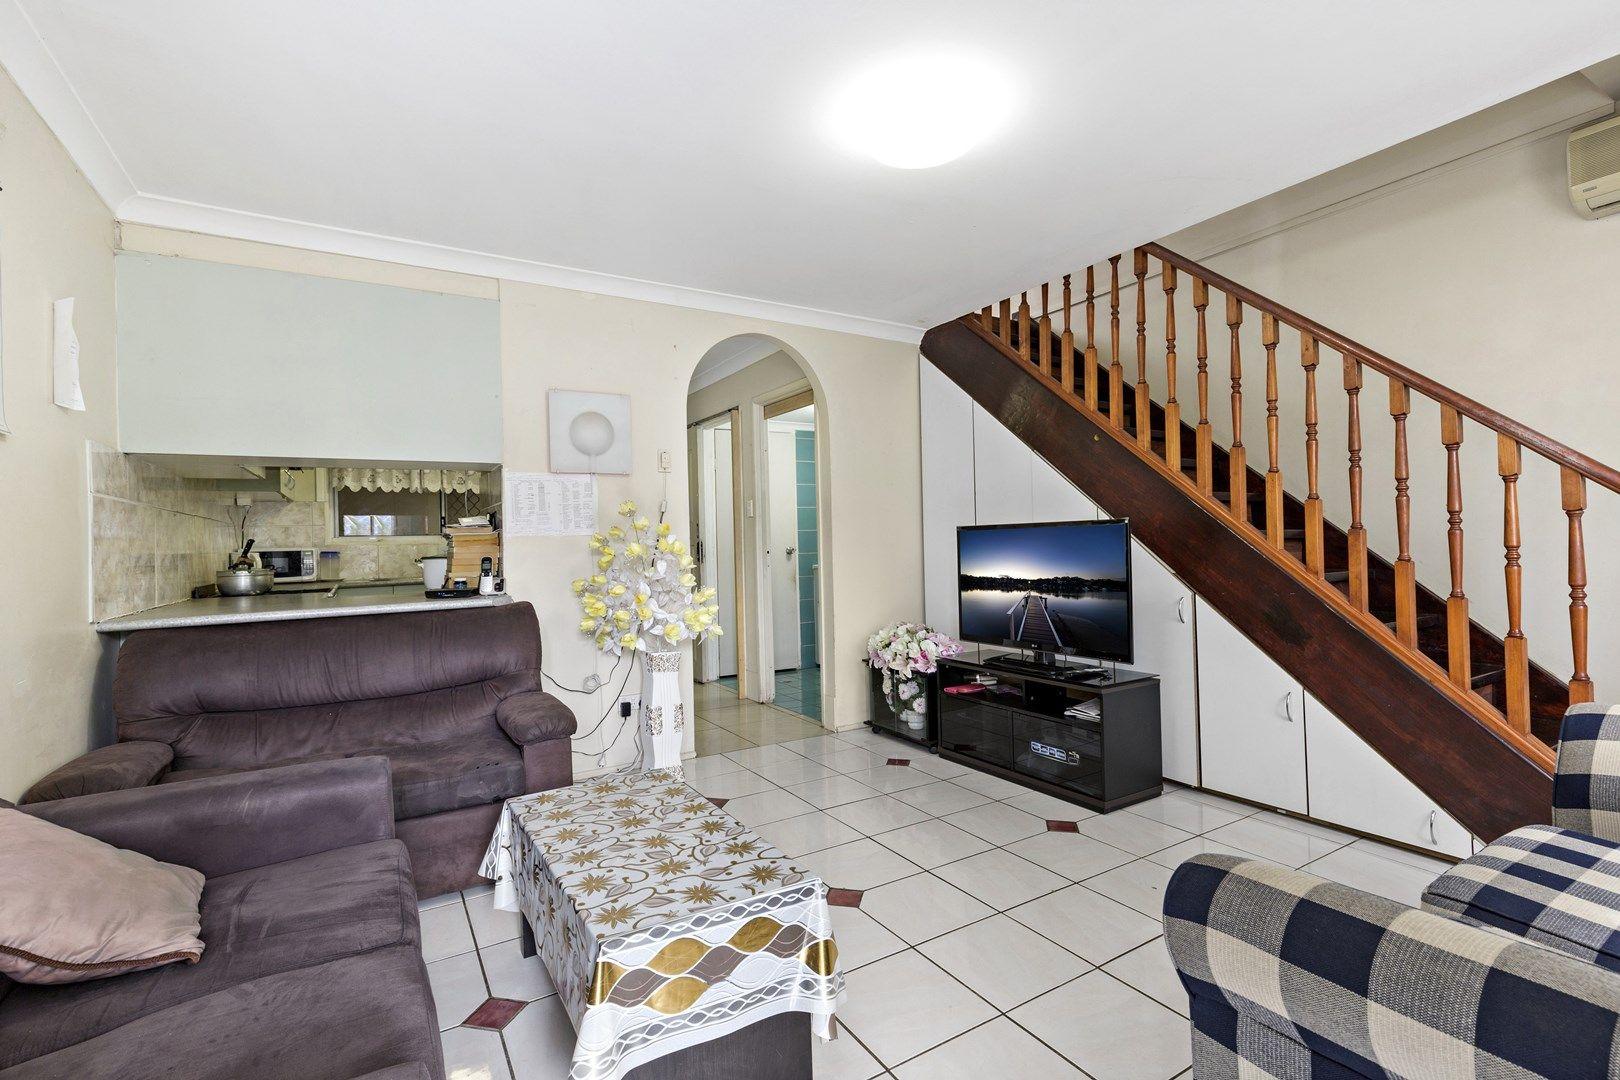 5/50 Blackwood Rd, Logan Central QLD 4114, Image 0